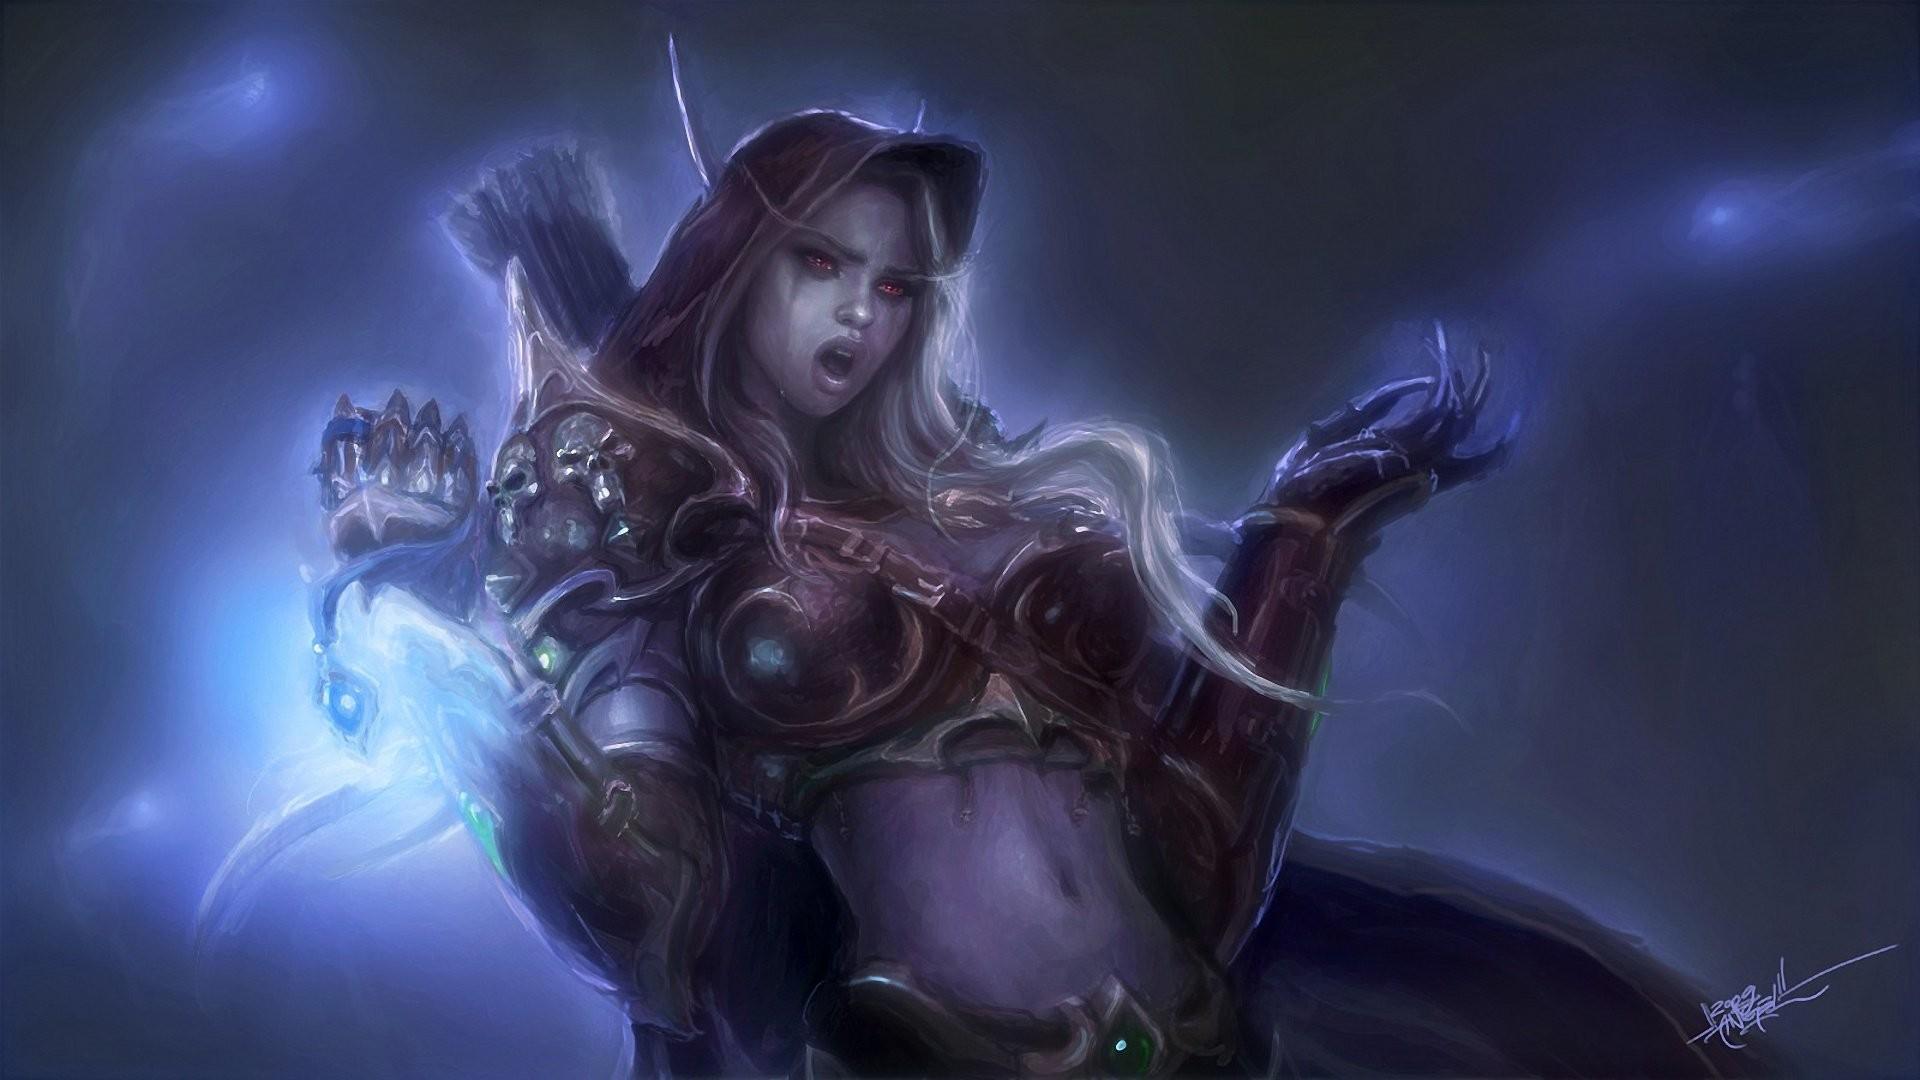 World Of Warcraft Night Elf Wallpaper Free Download